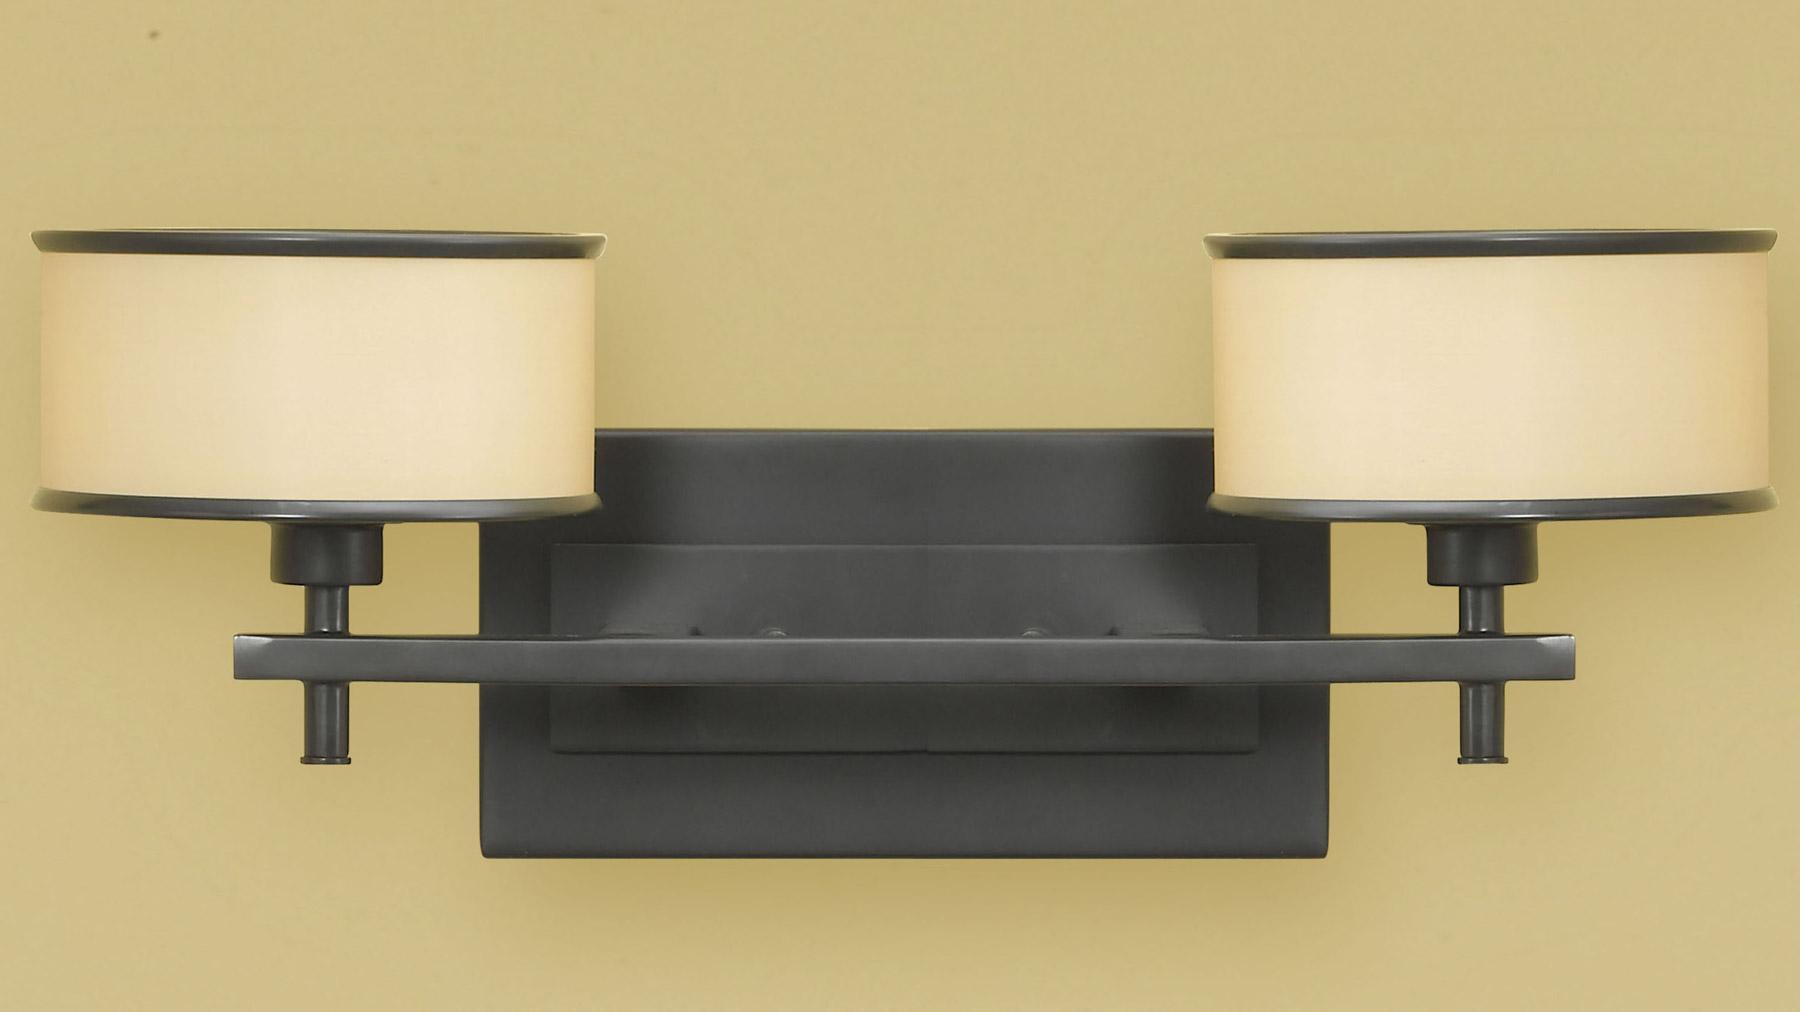 home wall lighting bathroom vanity lights murray feiss vs13702. Black Bedroom Furniture Sets. Home Design Ideas